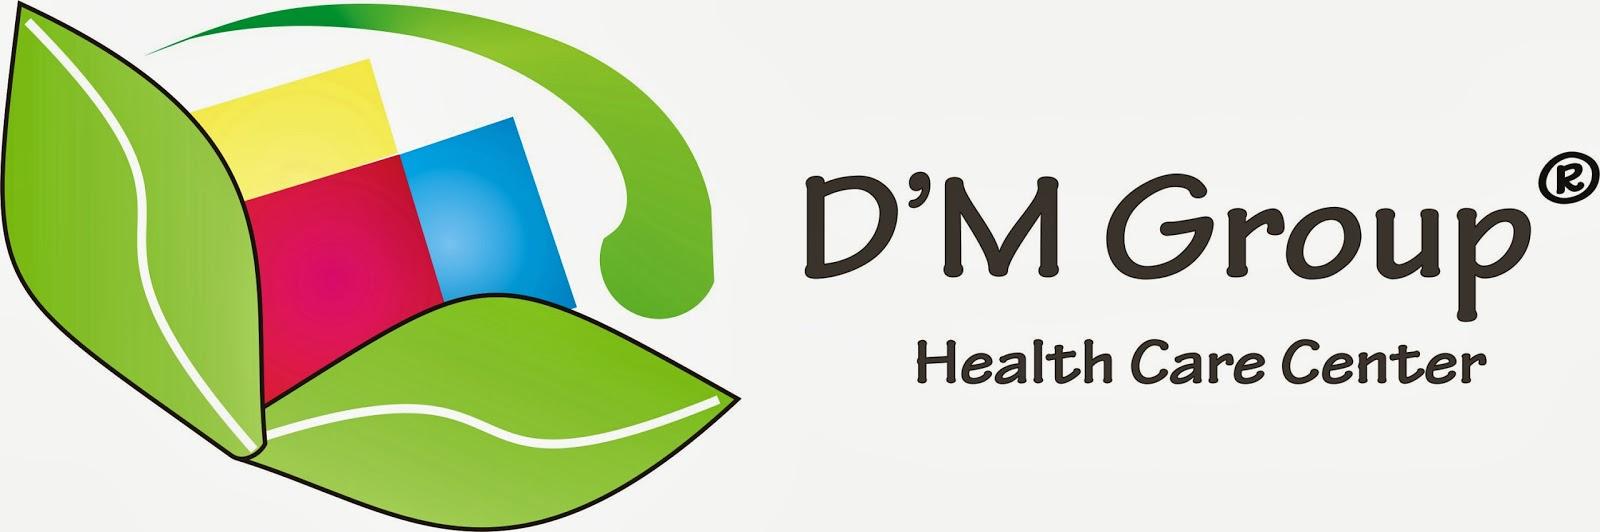 Contoh Desain Logo Klinik Kesehatan